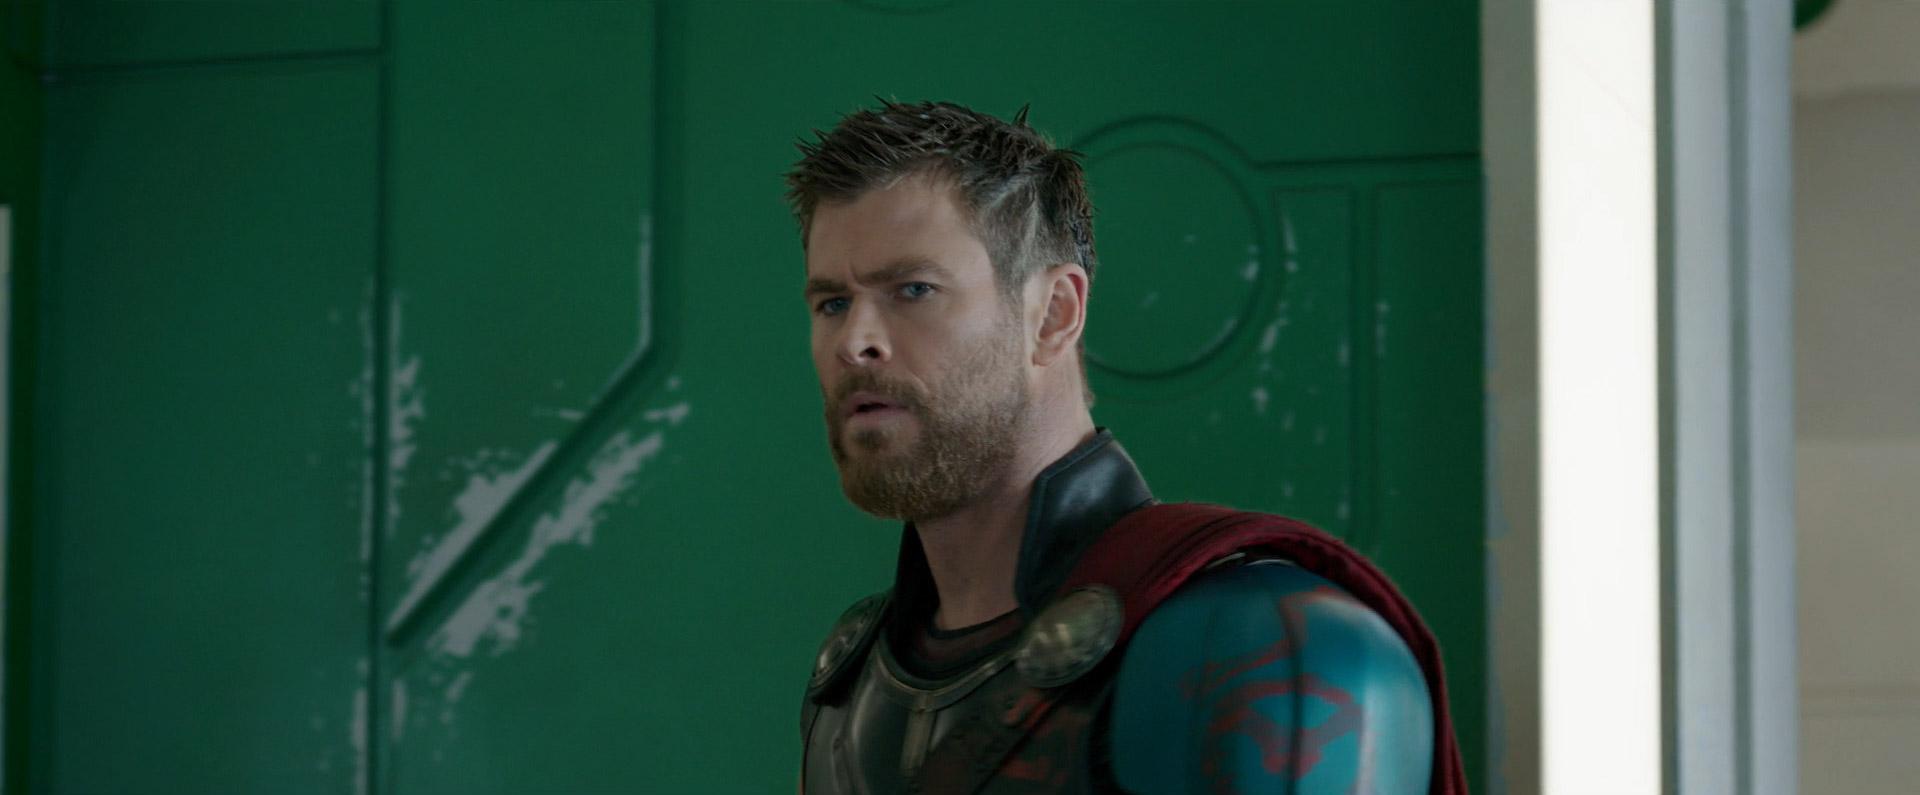 Thor: Ragnarok, Men in Black 4